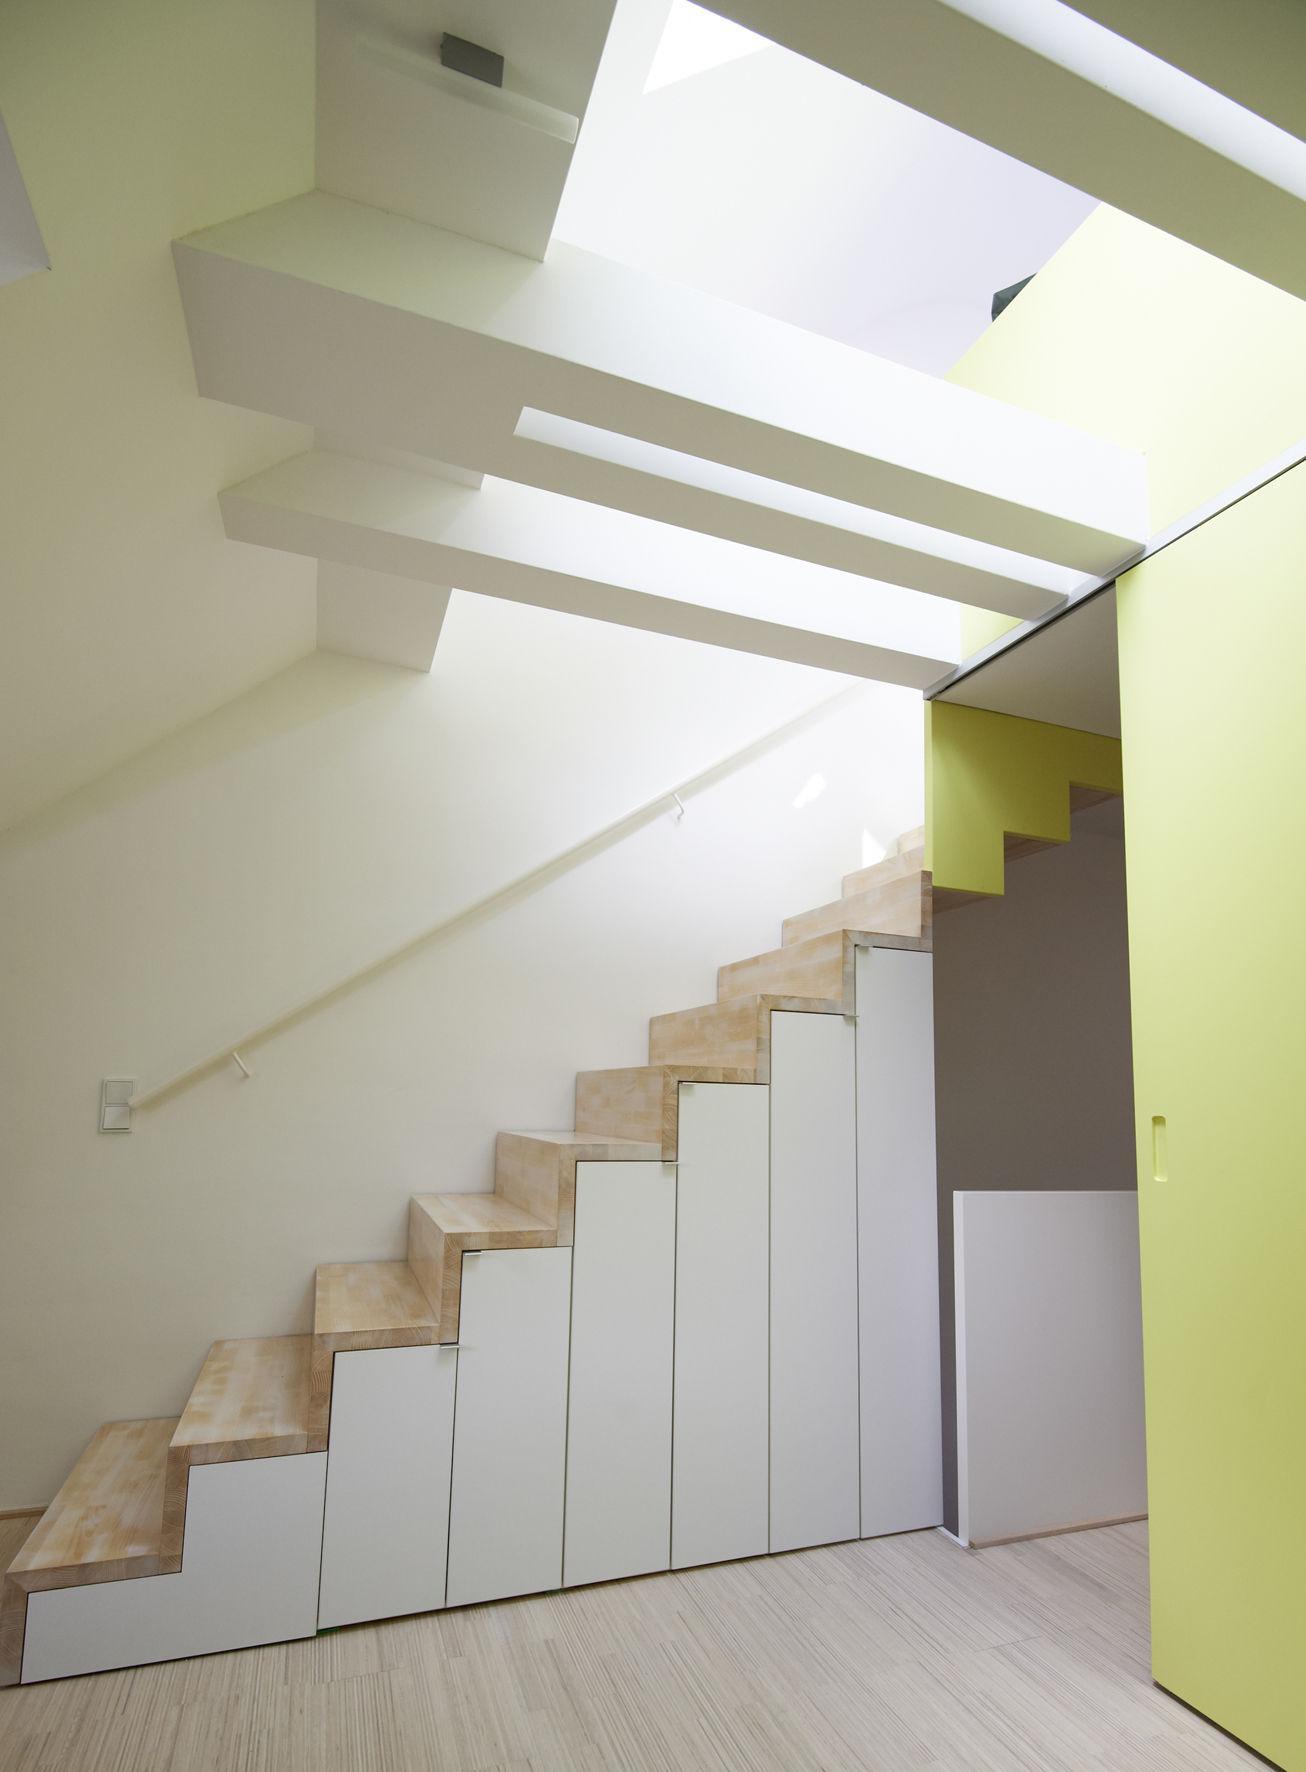 offene treppe im dachgeschoss. Black Bedroom Furniture Sets. Home Design Ideas